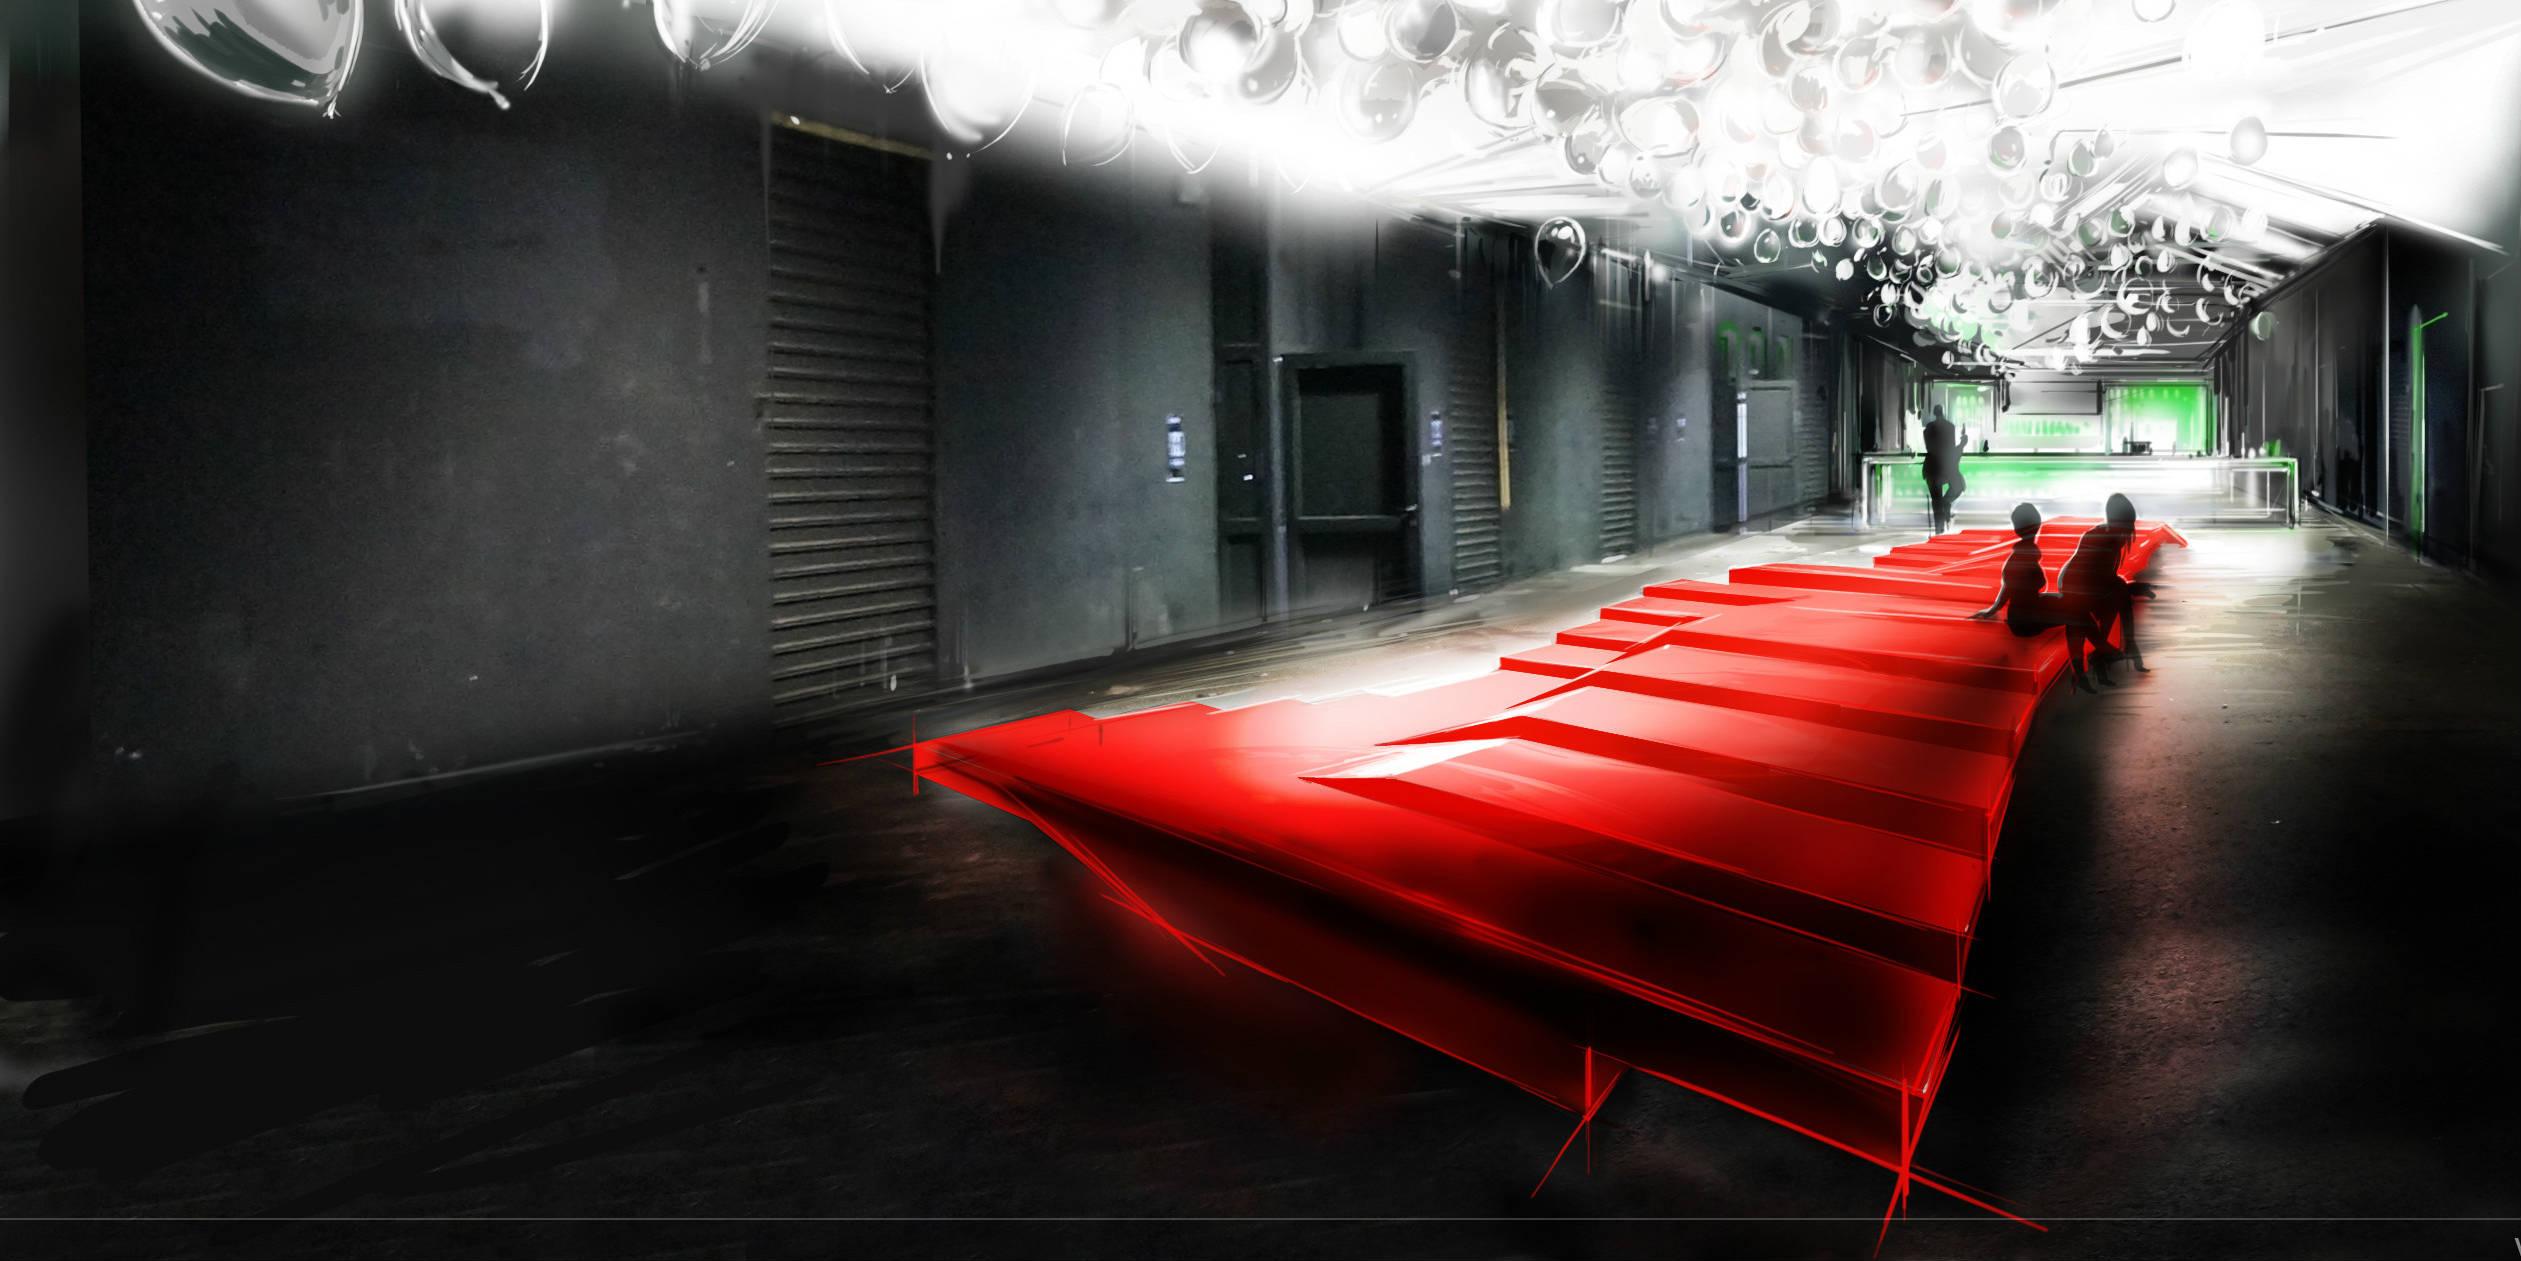 Hyundai at 2013 milan design week with innovative for Art design milano